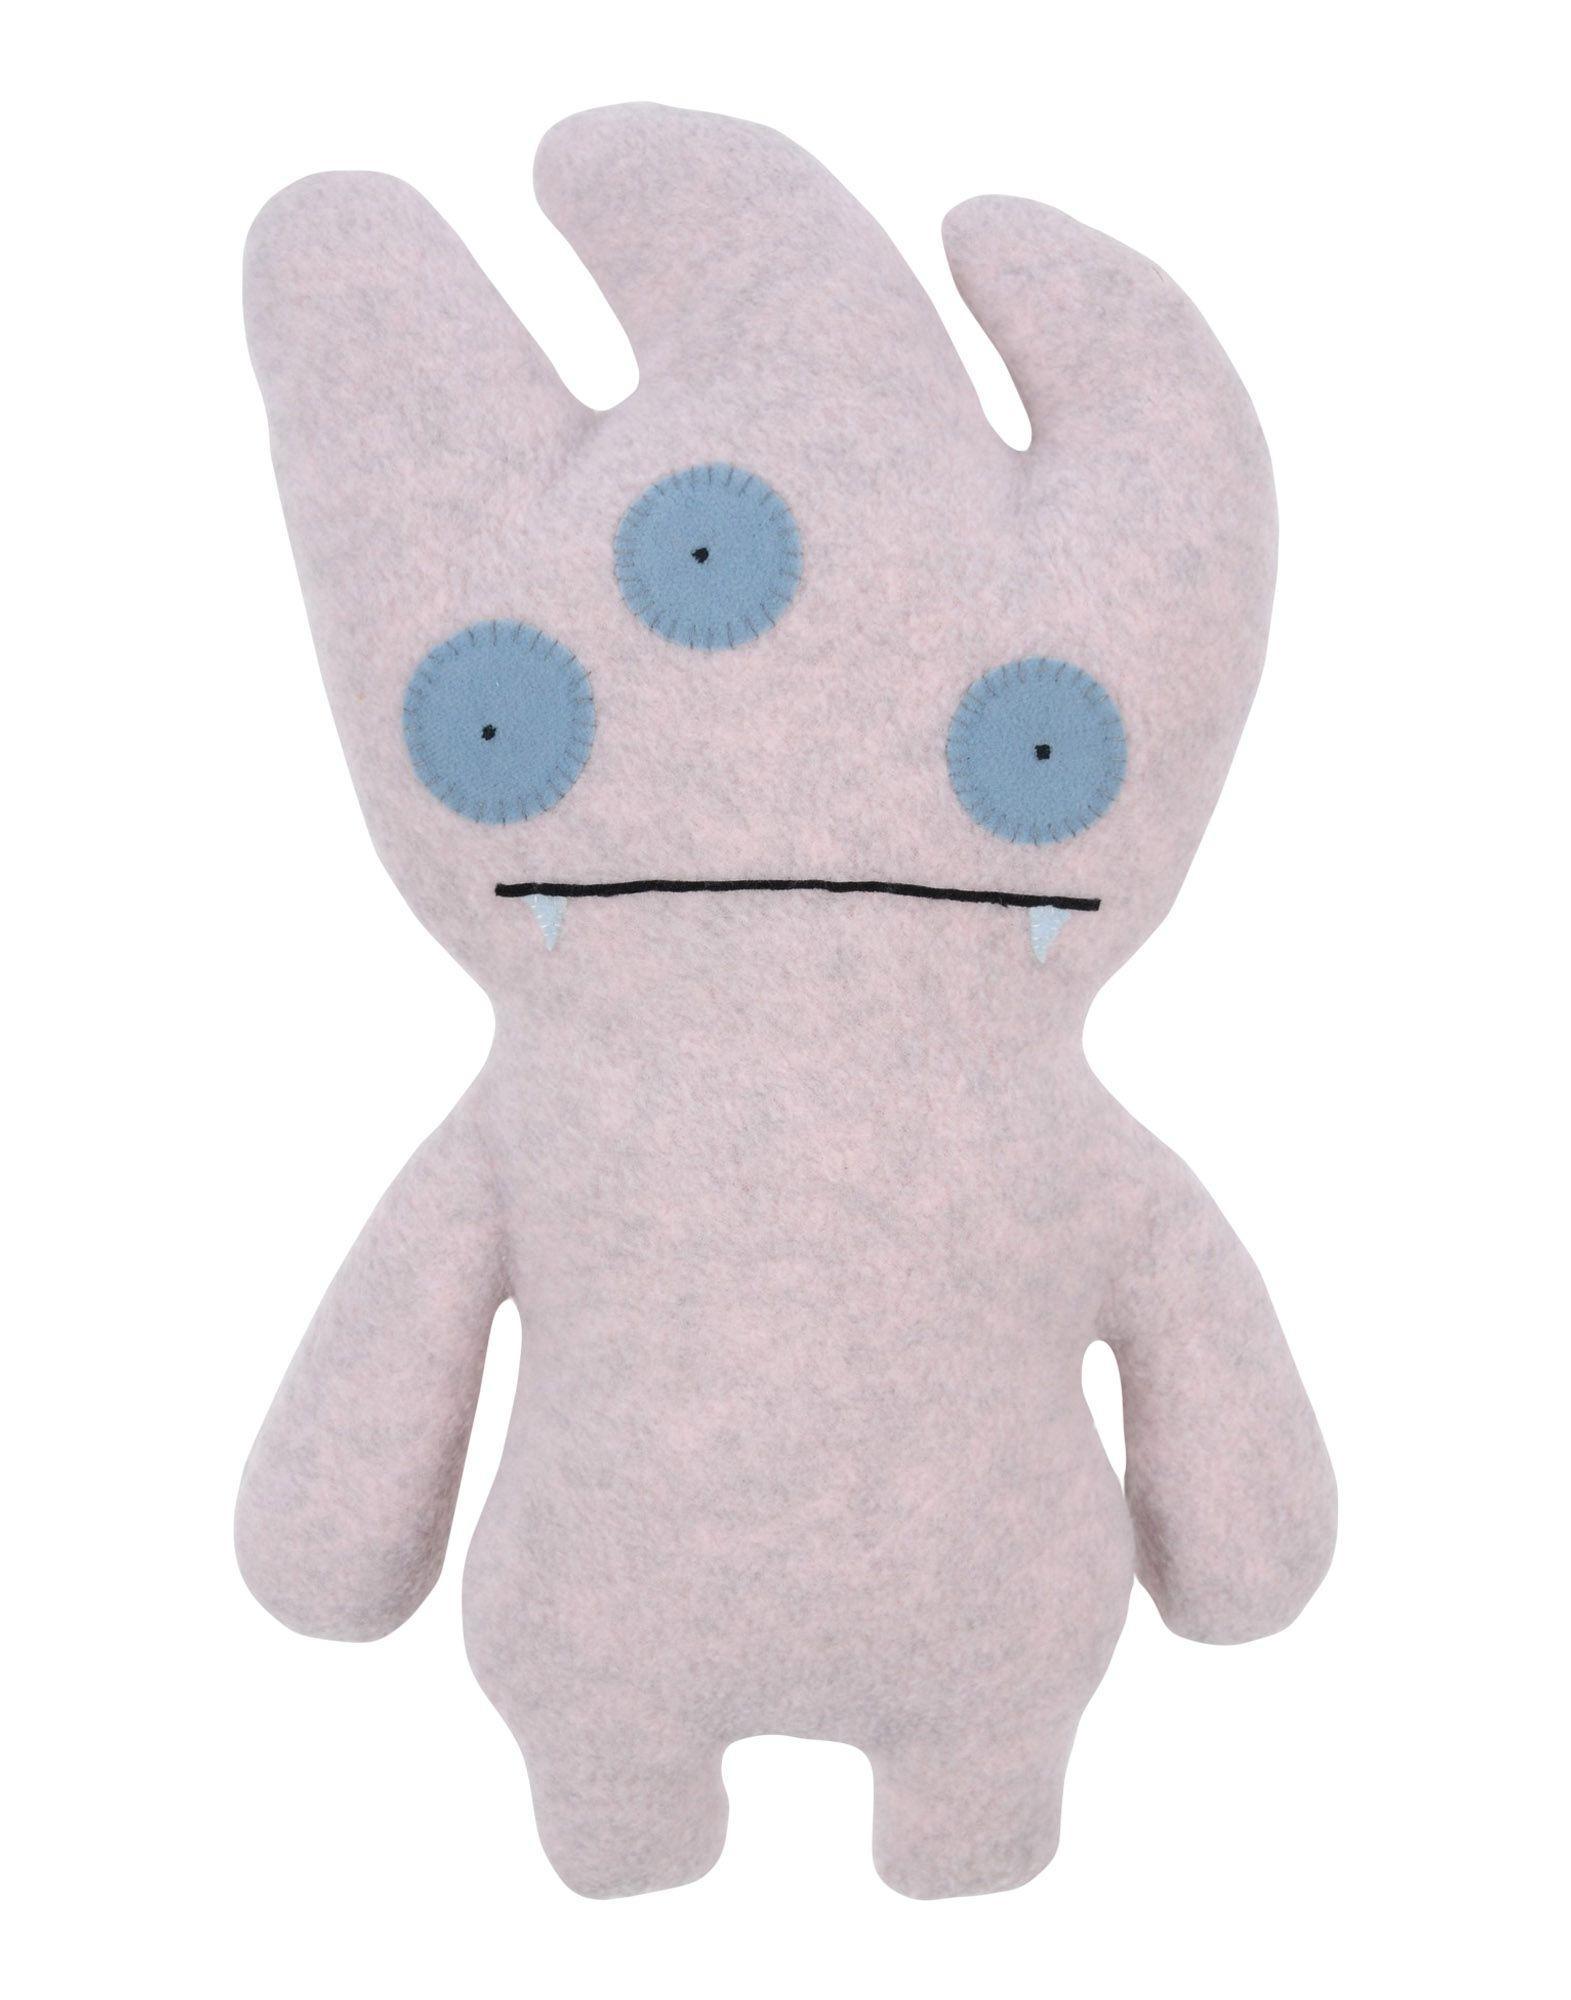 UGLYDOLL Куклы и мягкие игрушки мягкие игрушки estro совёнк подмигивающий